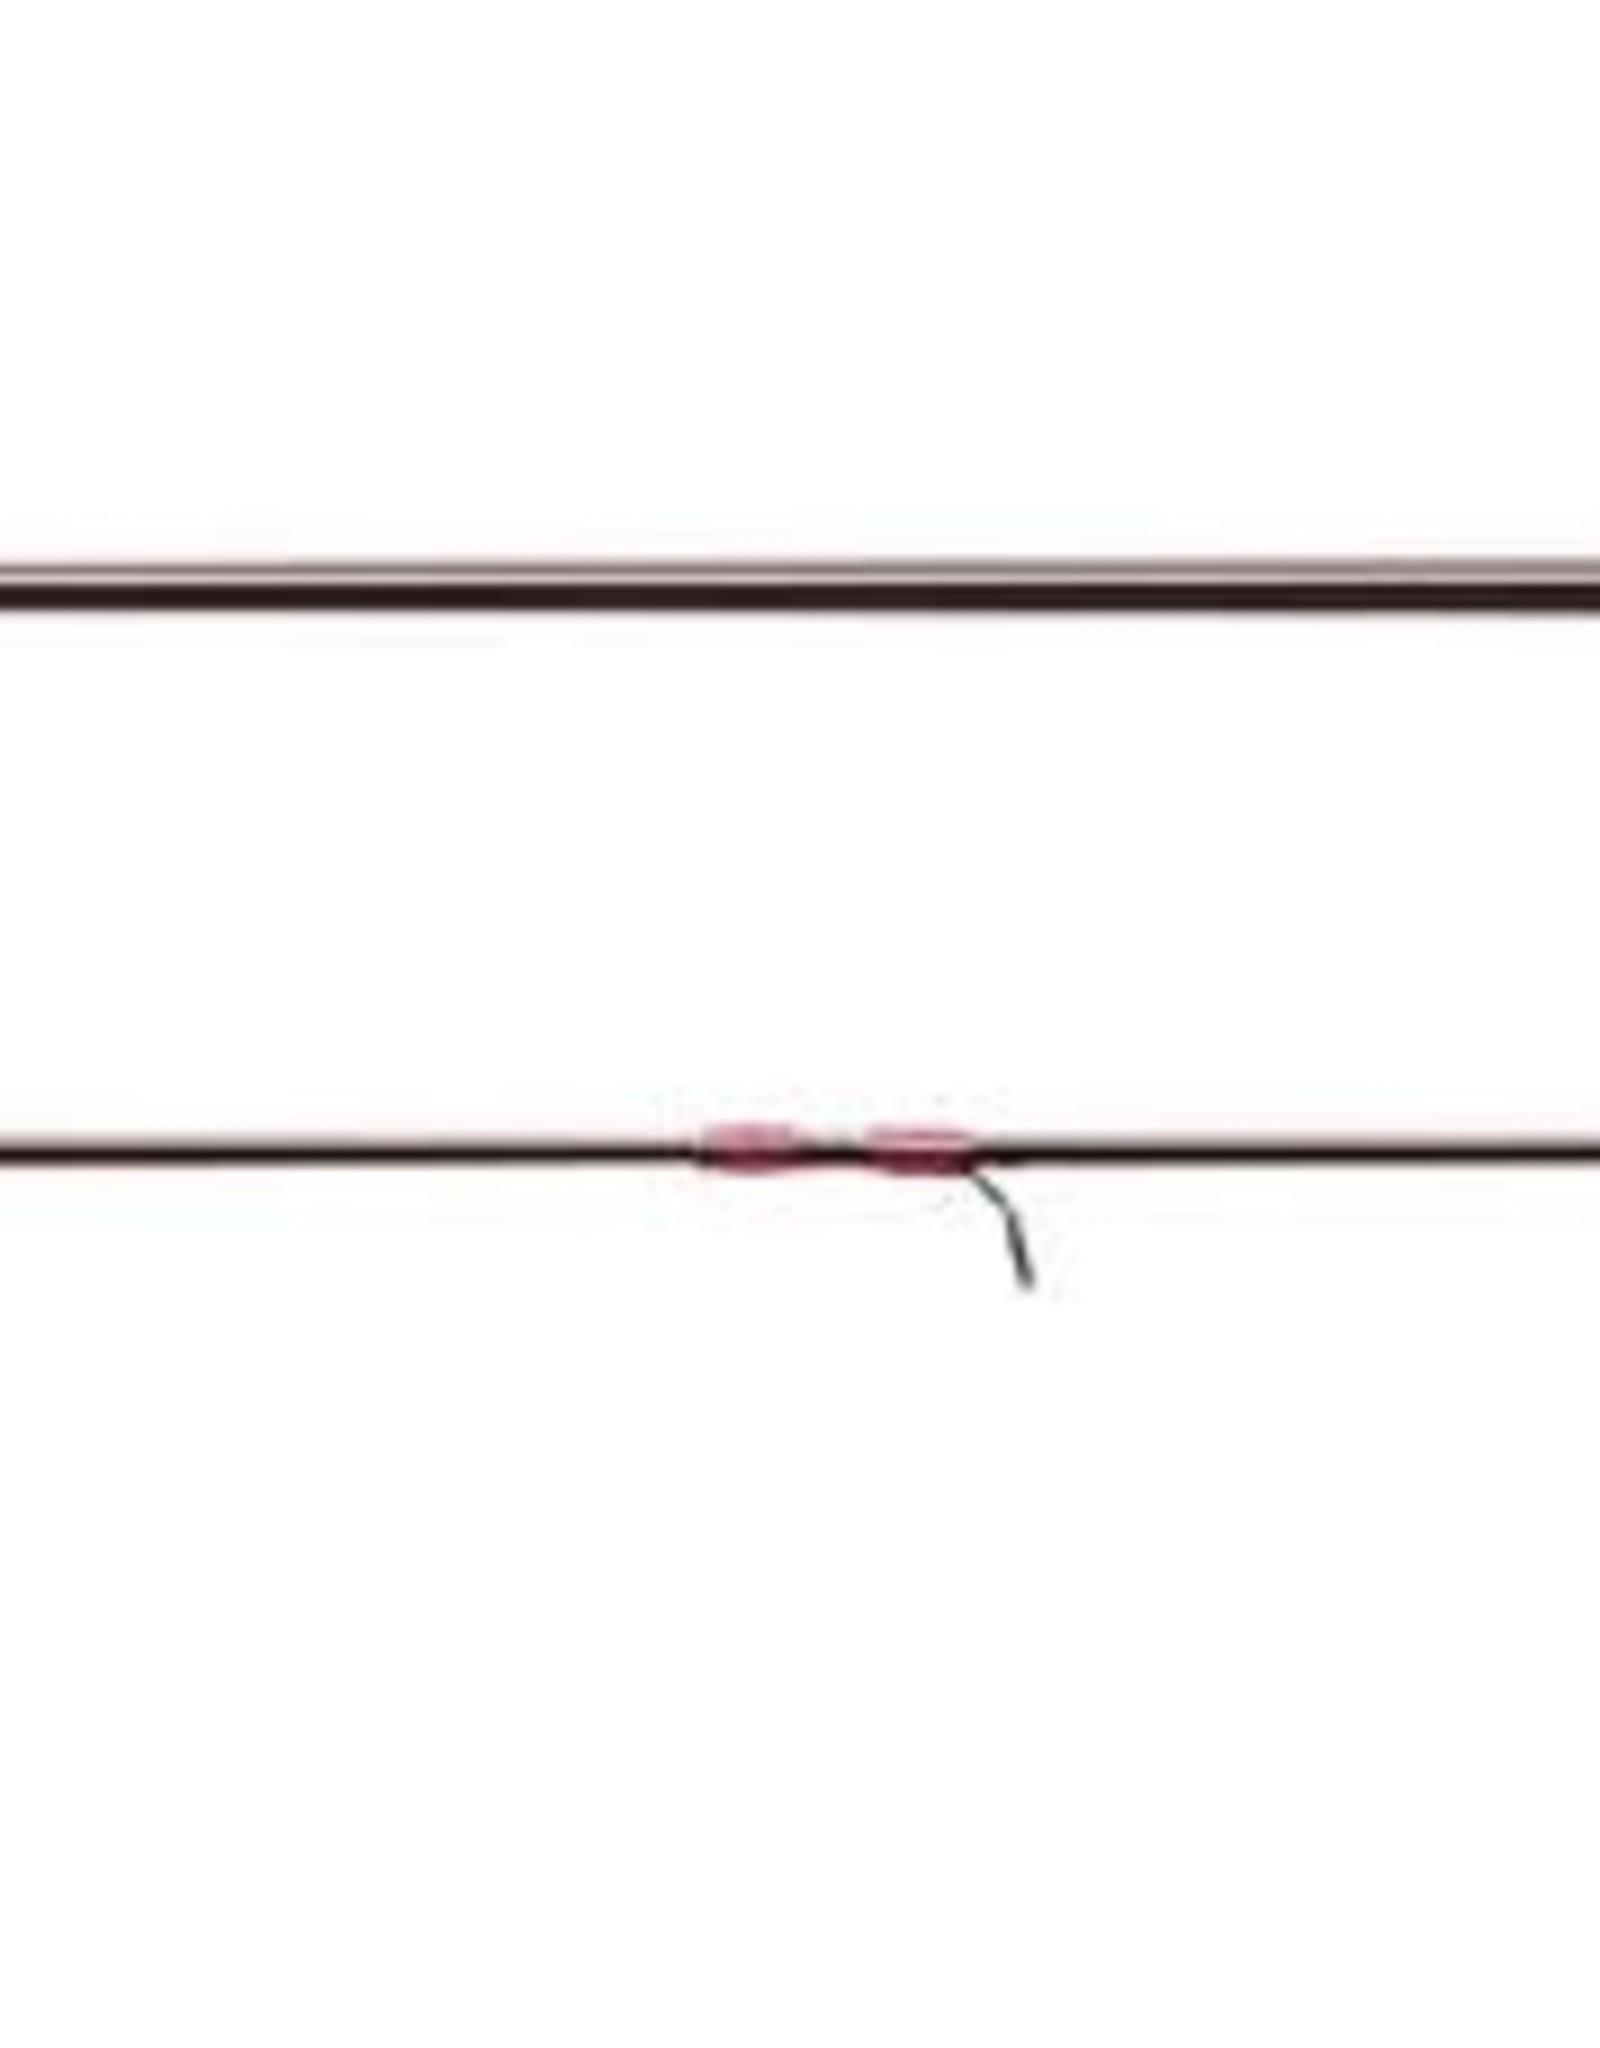 Daiwa Daiwa Spinmatic Spinning Rod